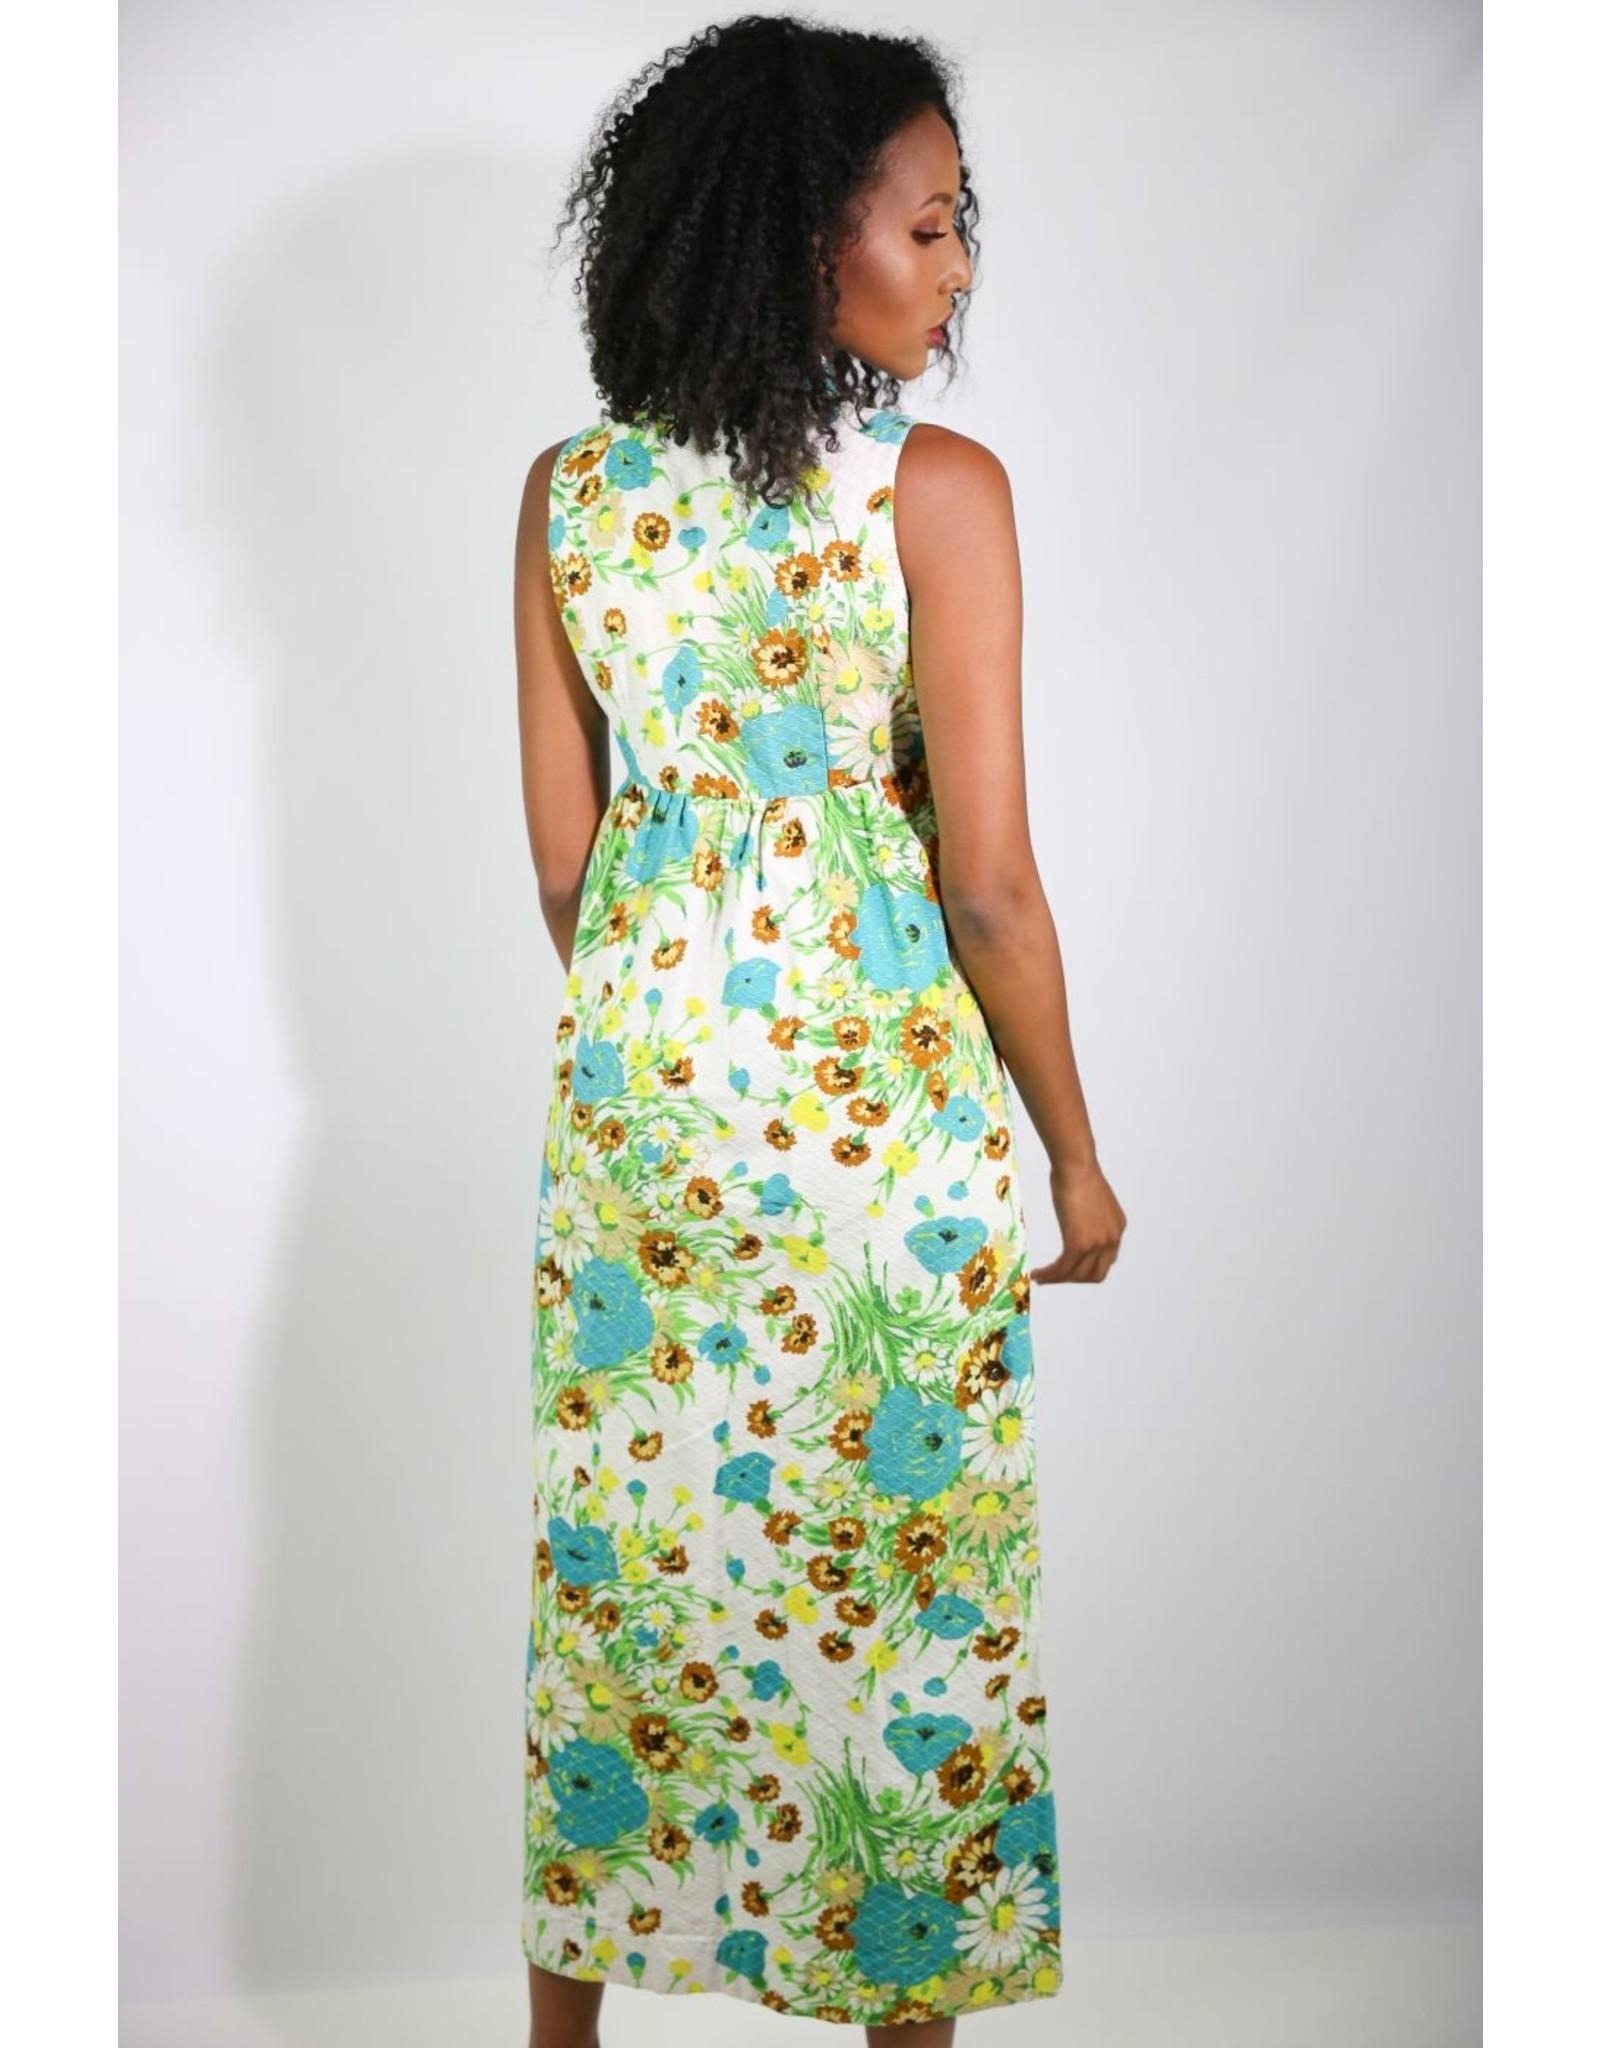 1970's White & Blue Floral Maxi Dress